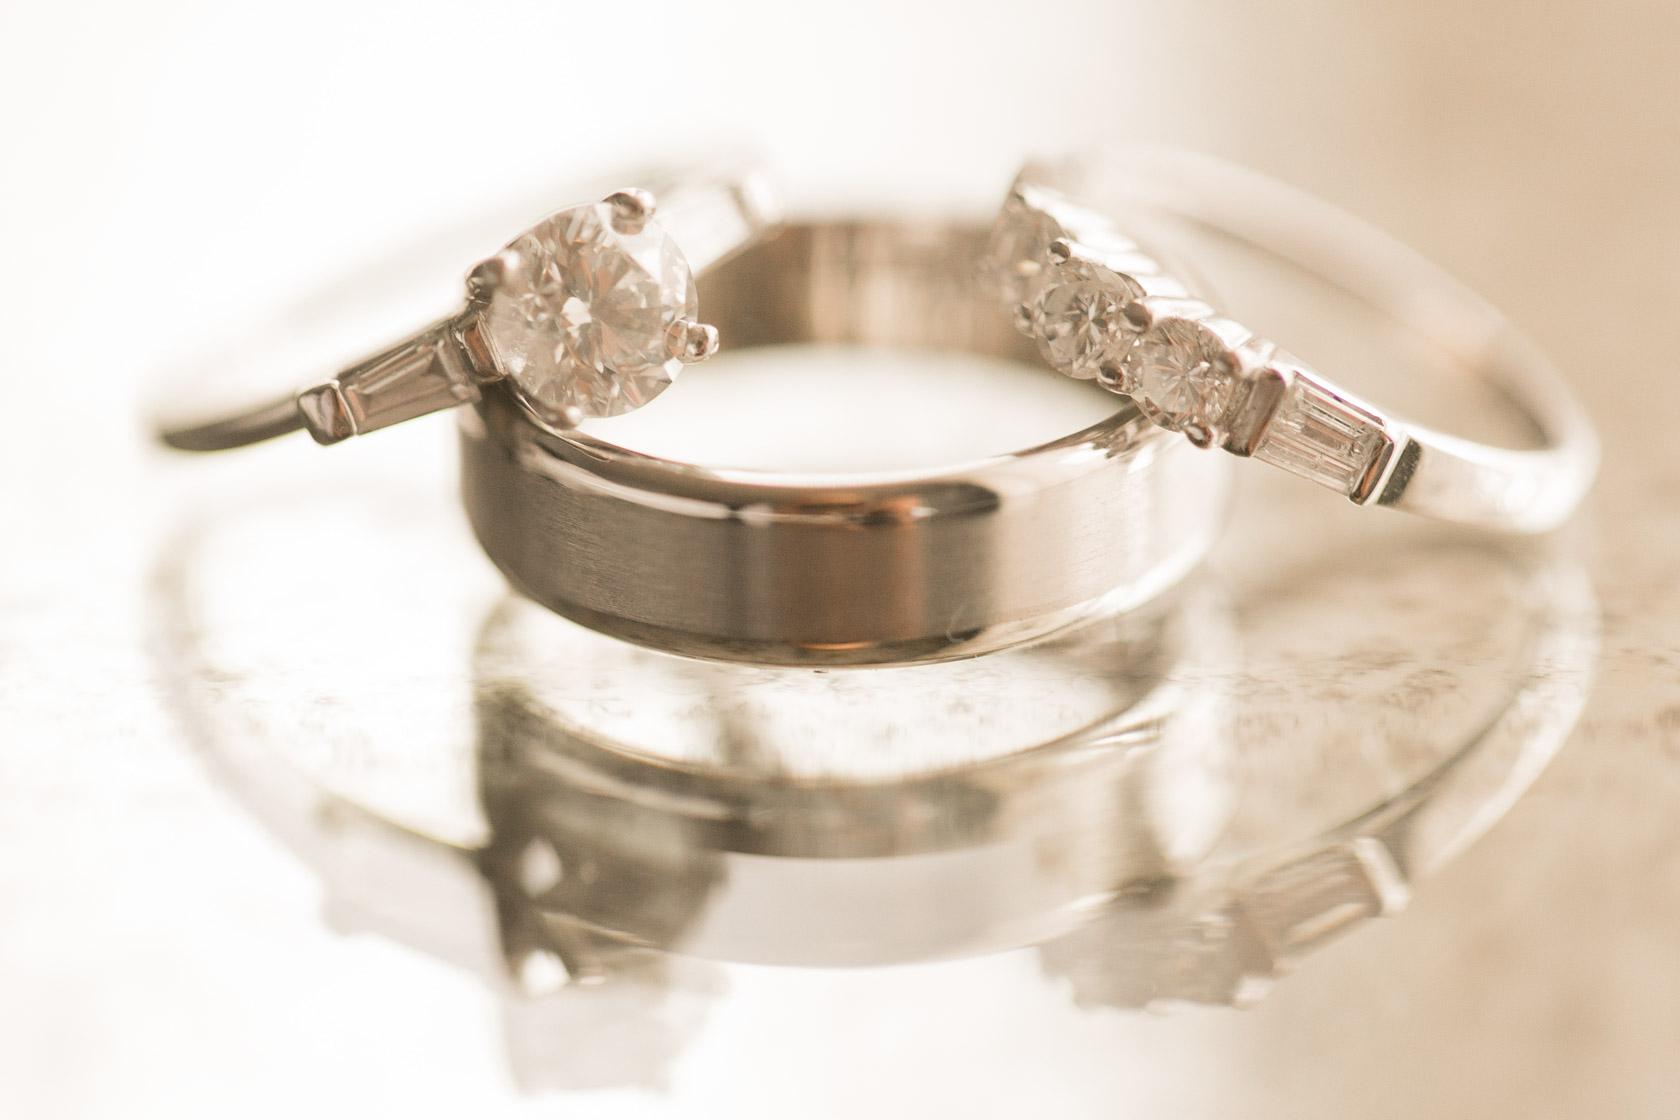 New Years Eve Wedding rings